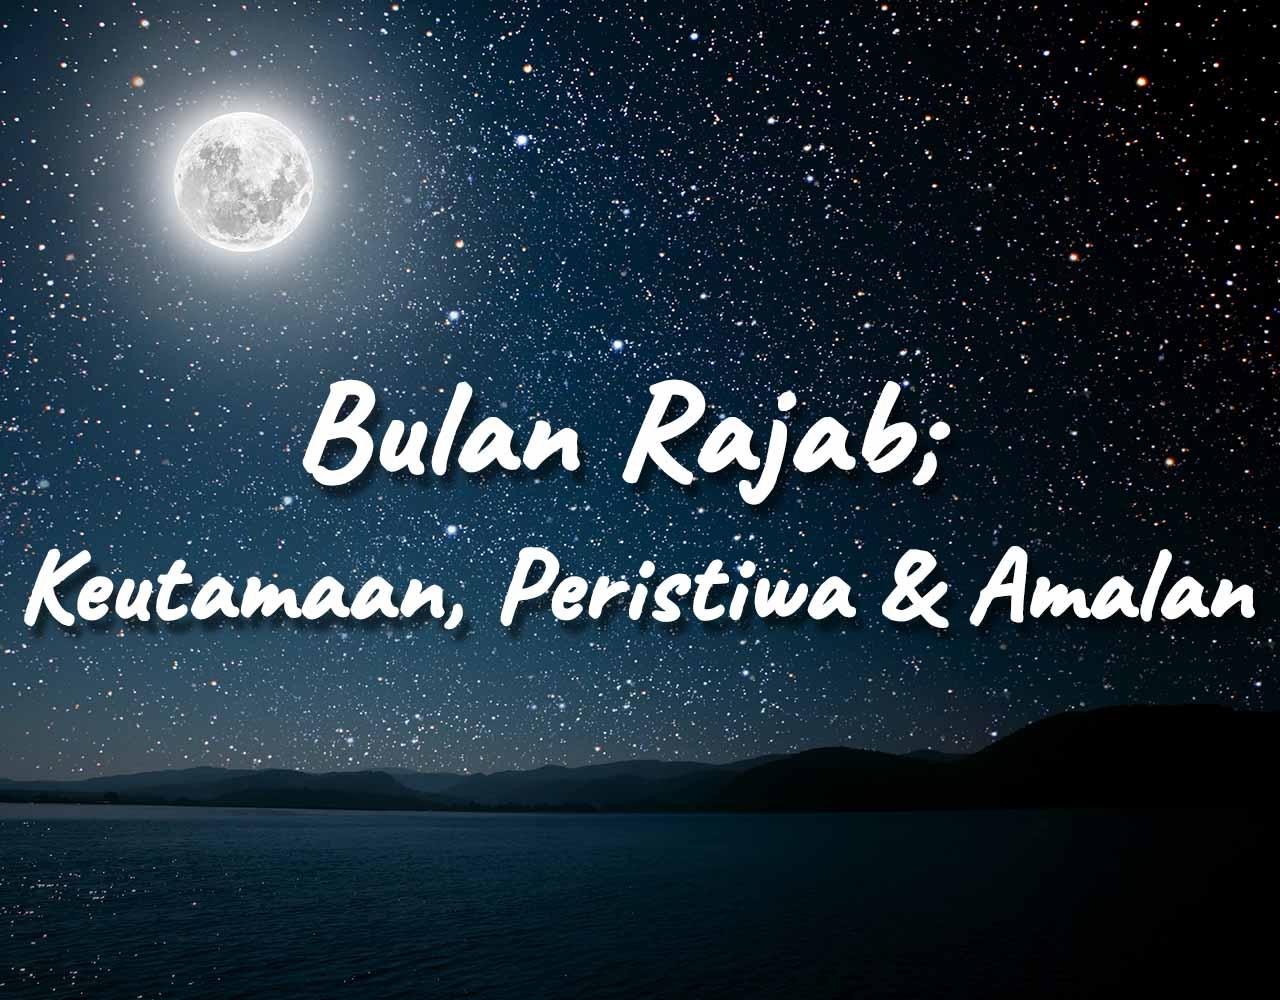 Khutbah Jumat - Bulan Rajab; Keutamaan, Peristiwa & Amalan